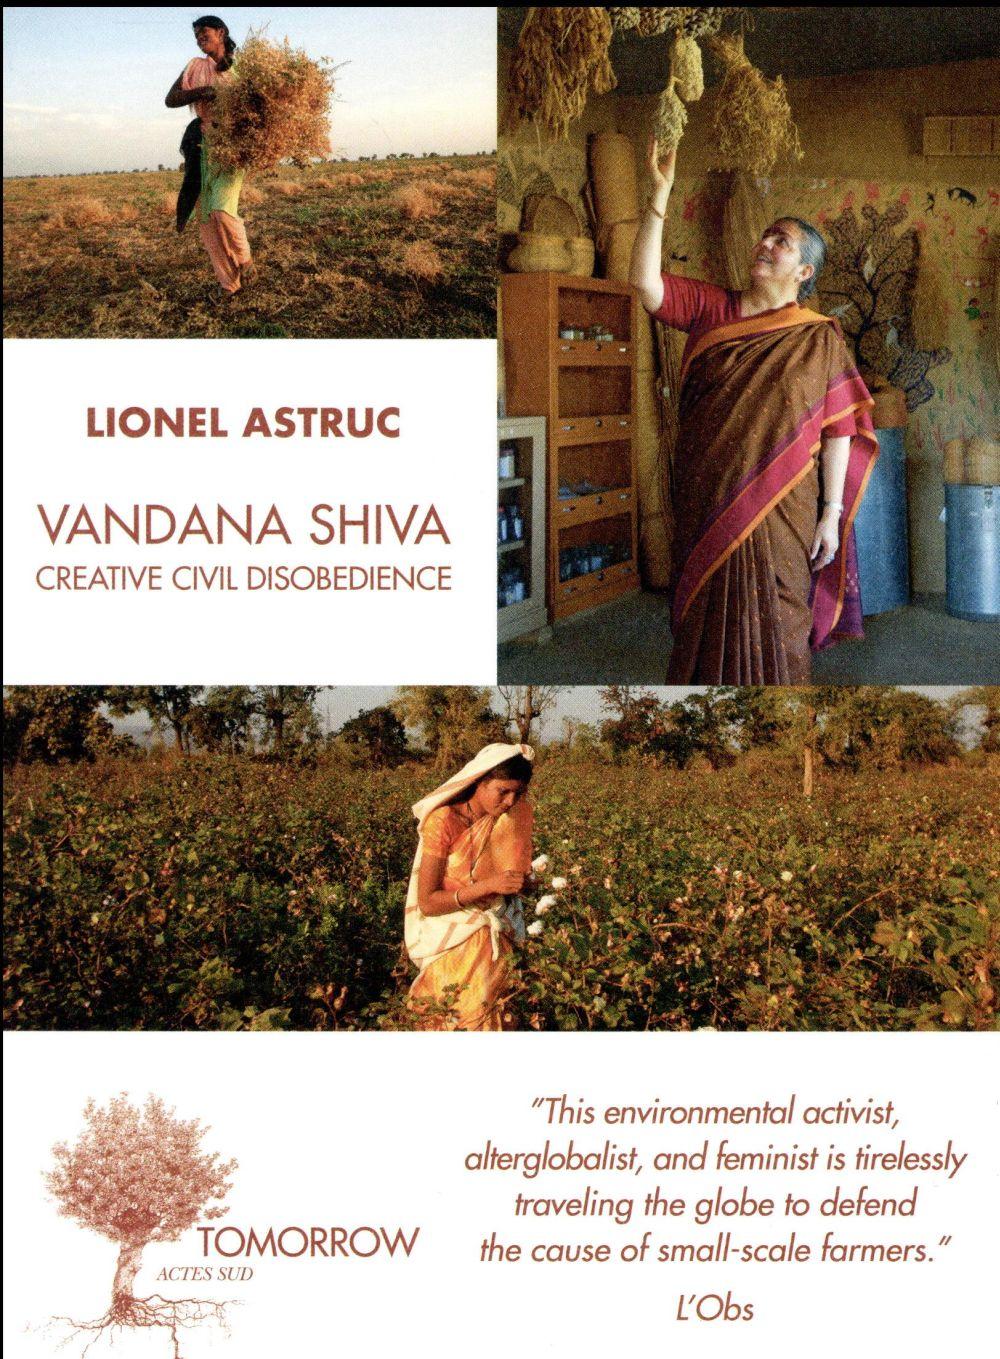 VANDANA SHIVA CREATIVE CIVIL DISOBEDIENCE EN ANGLAIS